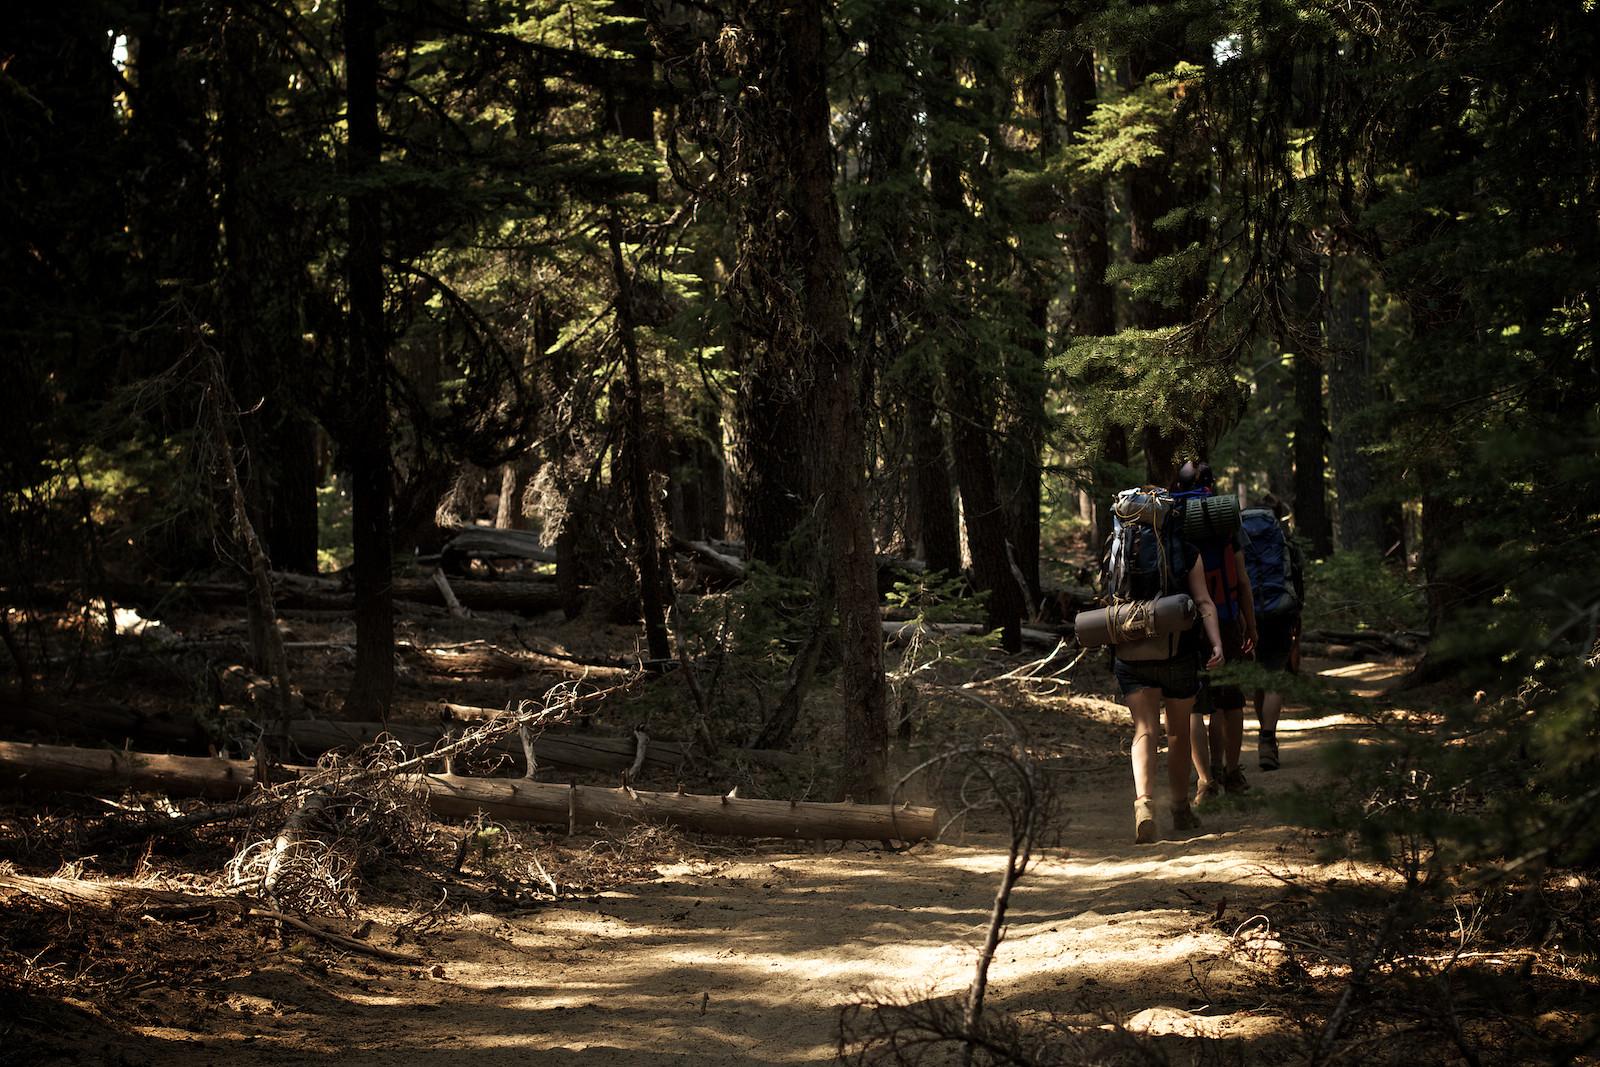 2012 Sisters Enduro Hiking - corytepper.com - Mountain Biking Pictures - Vital MTB